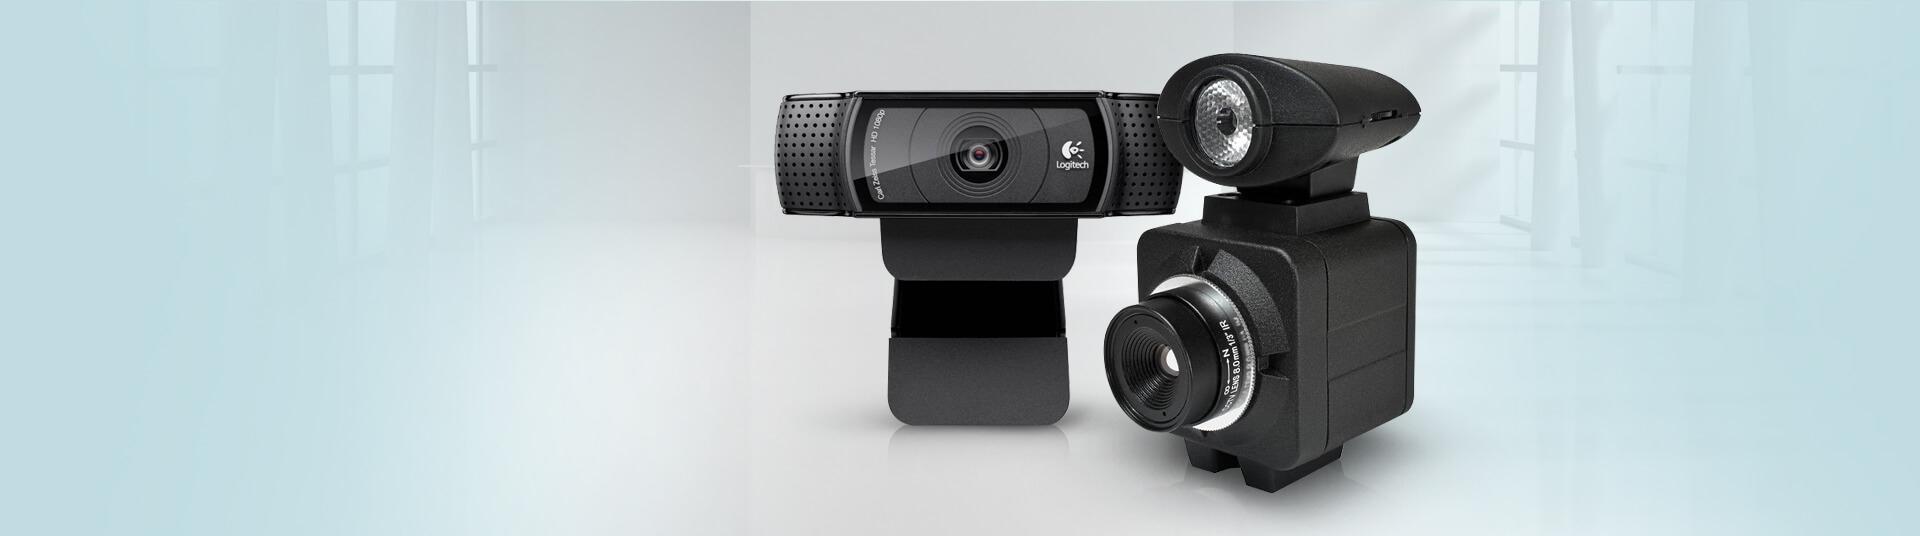 ID Cameras & Accessories